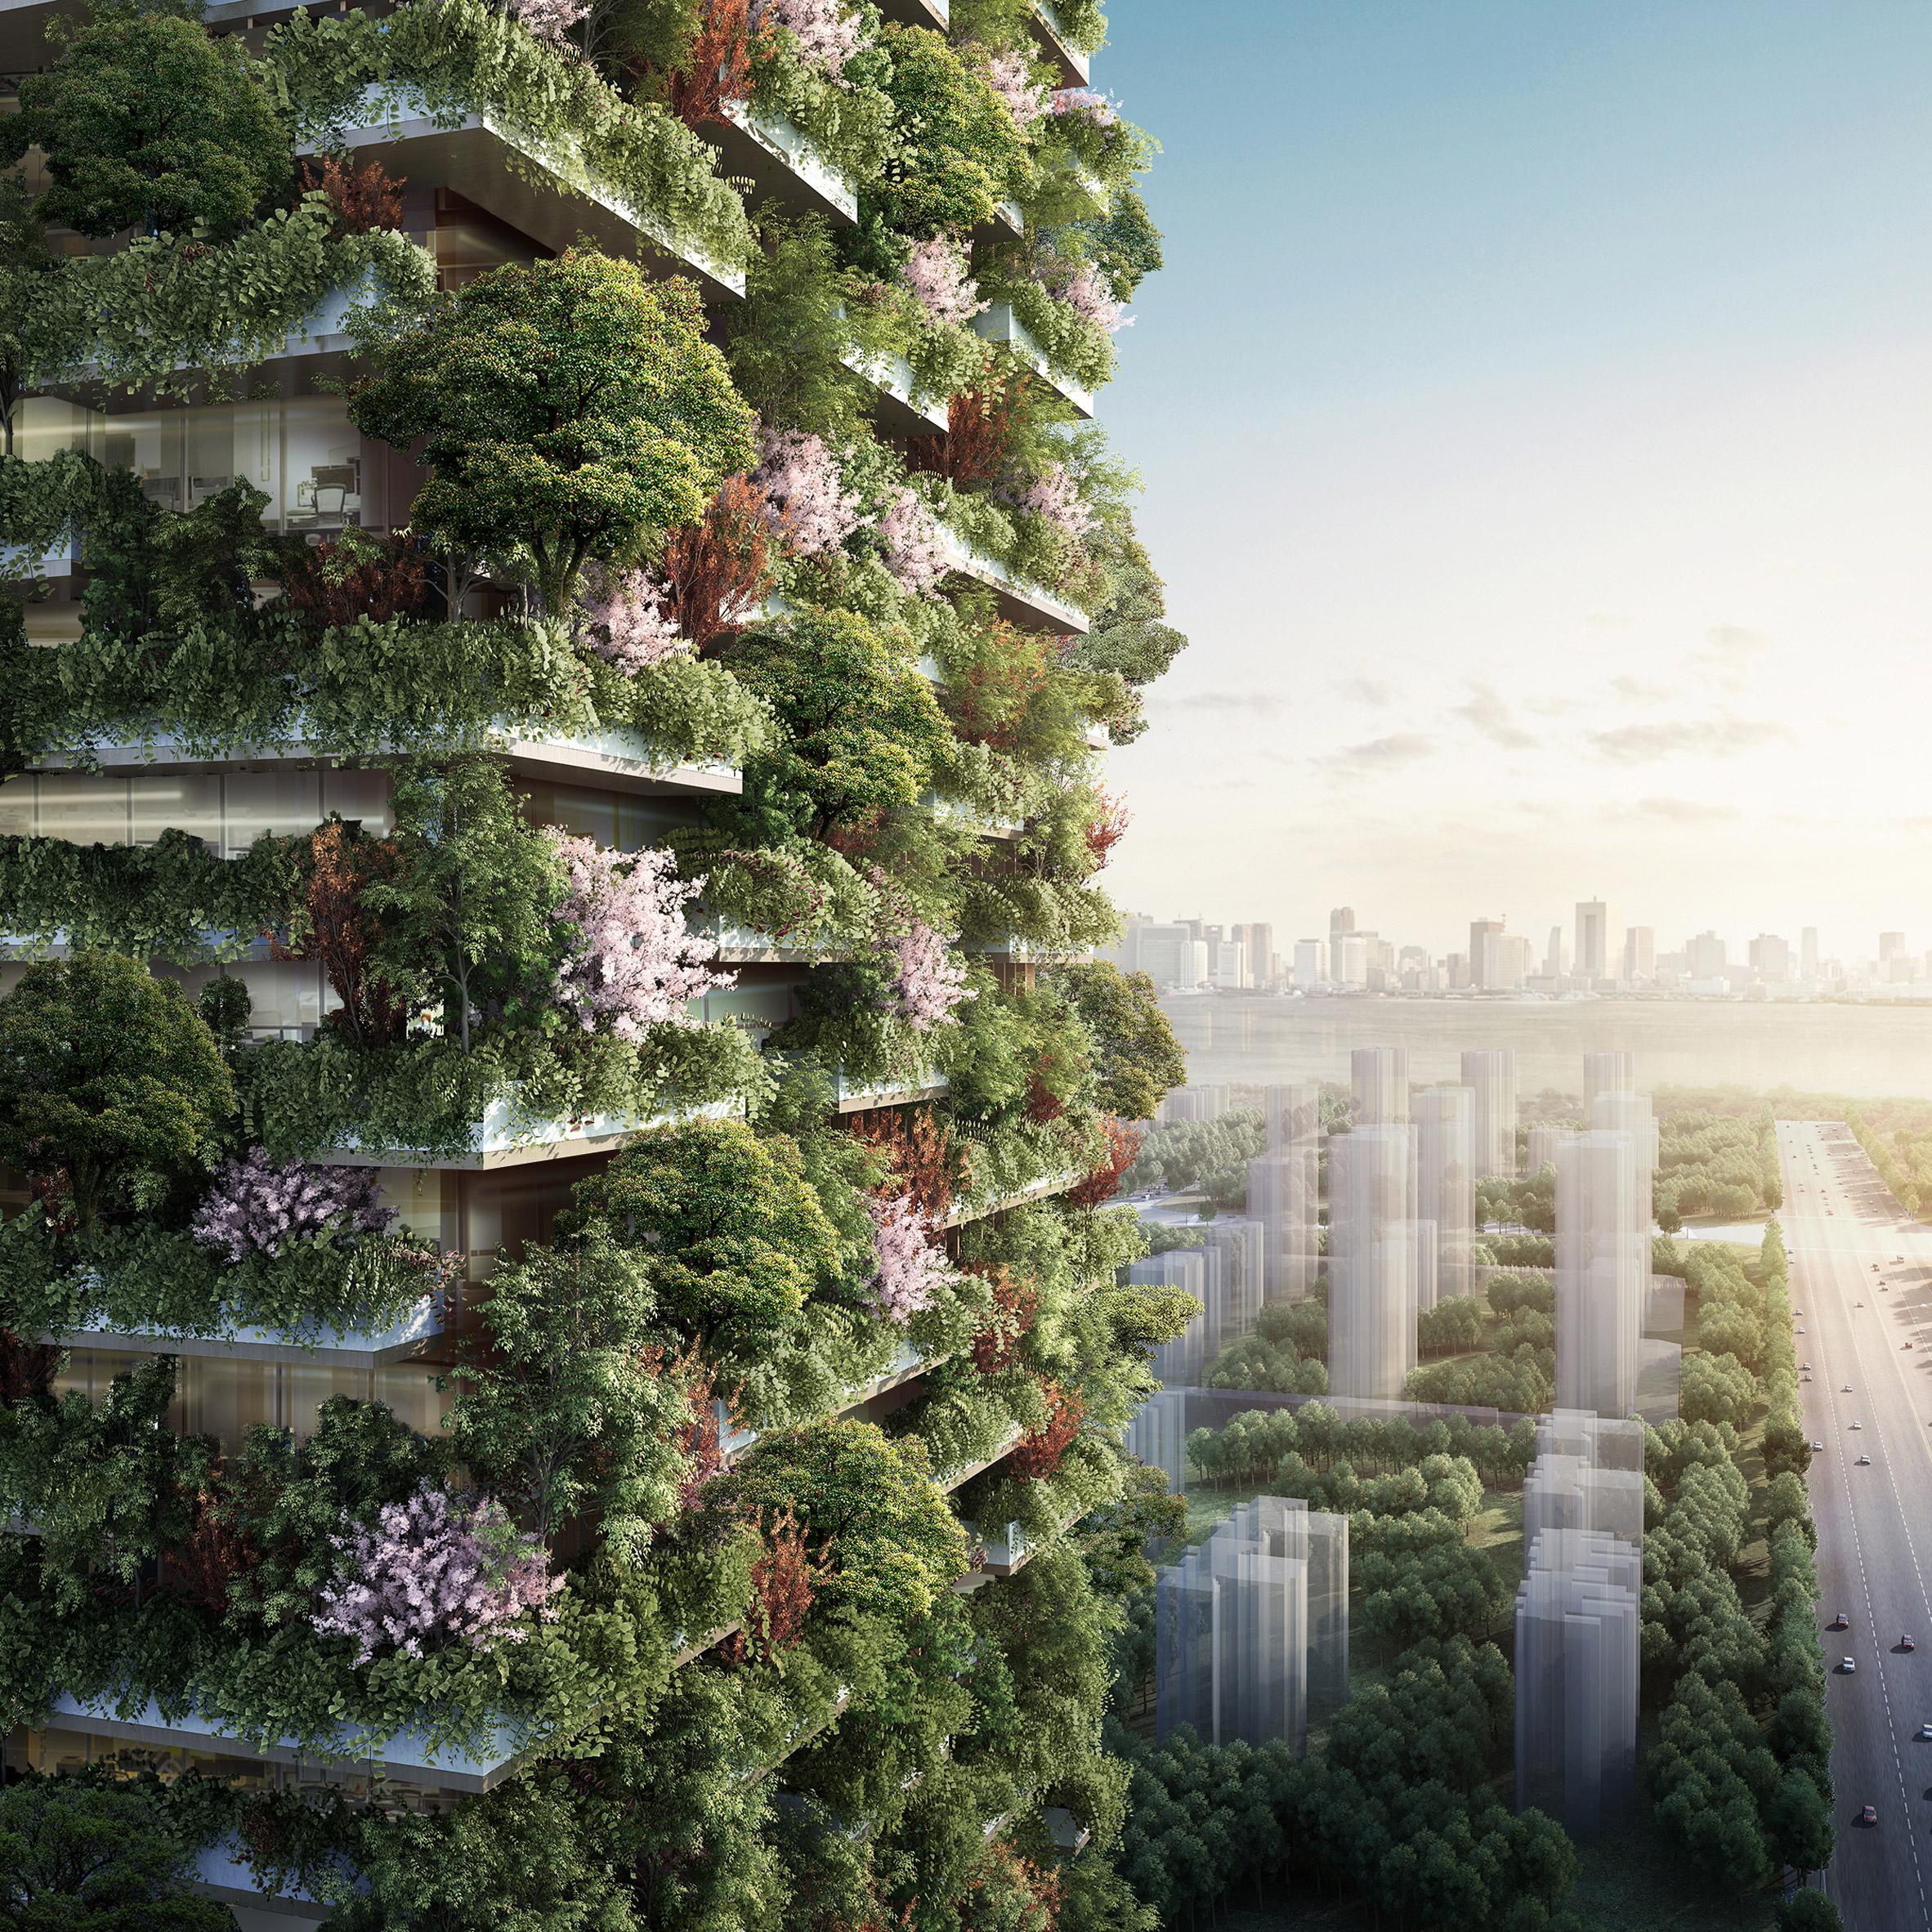 Vertical forests by architect Stefano Boeri | Dezeen